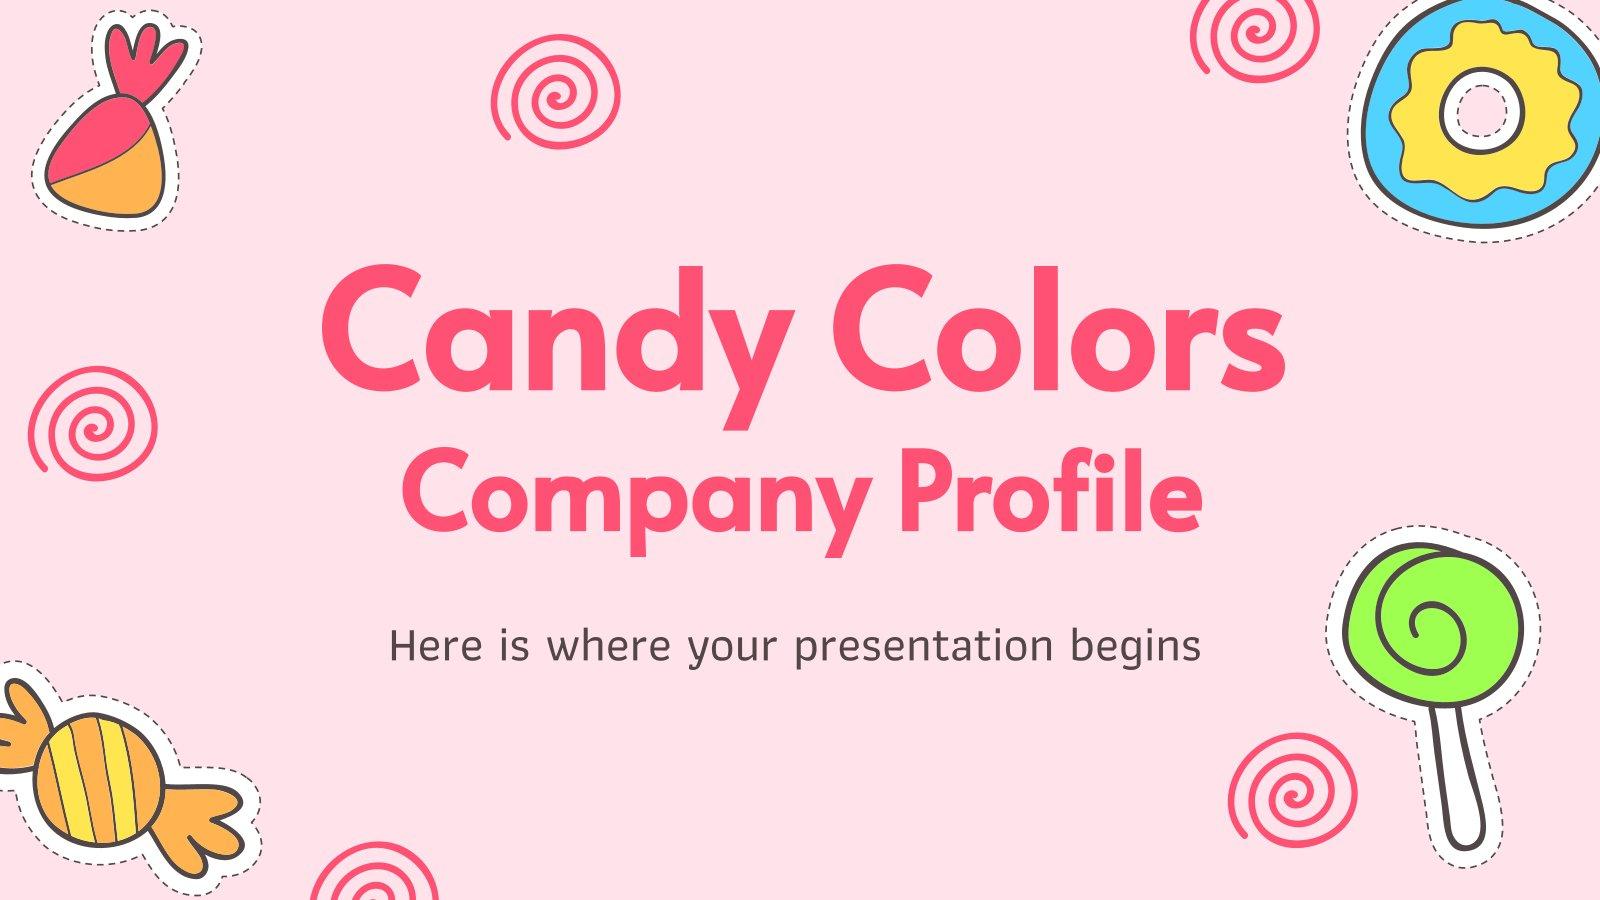 Candy Colors Company Profile presentation template